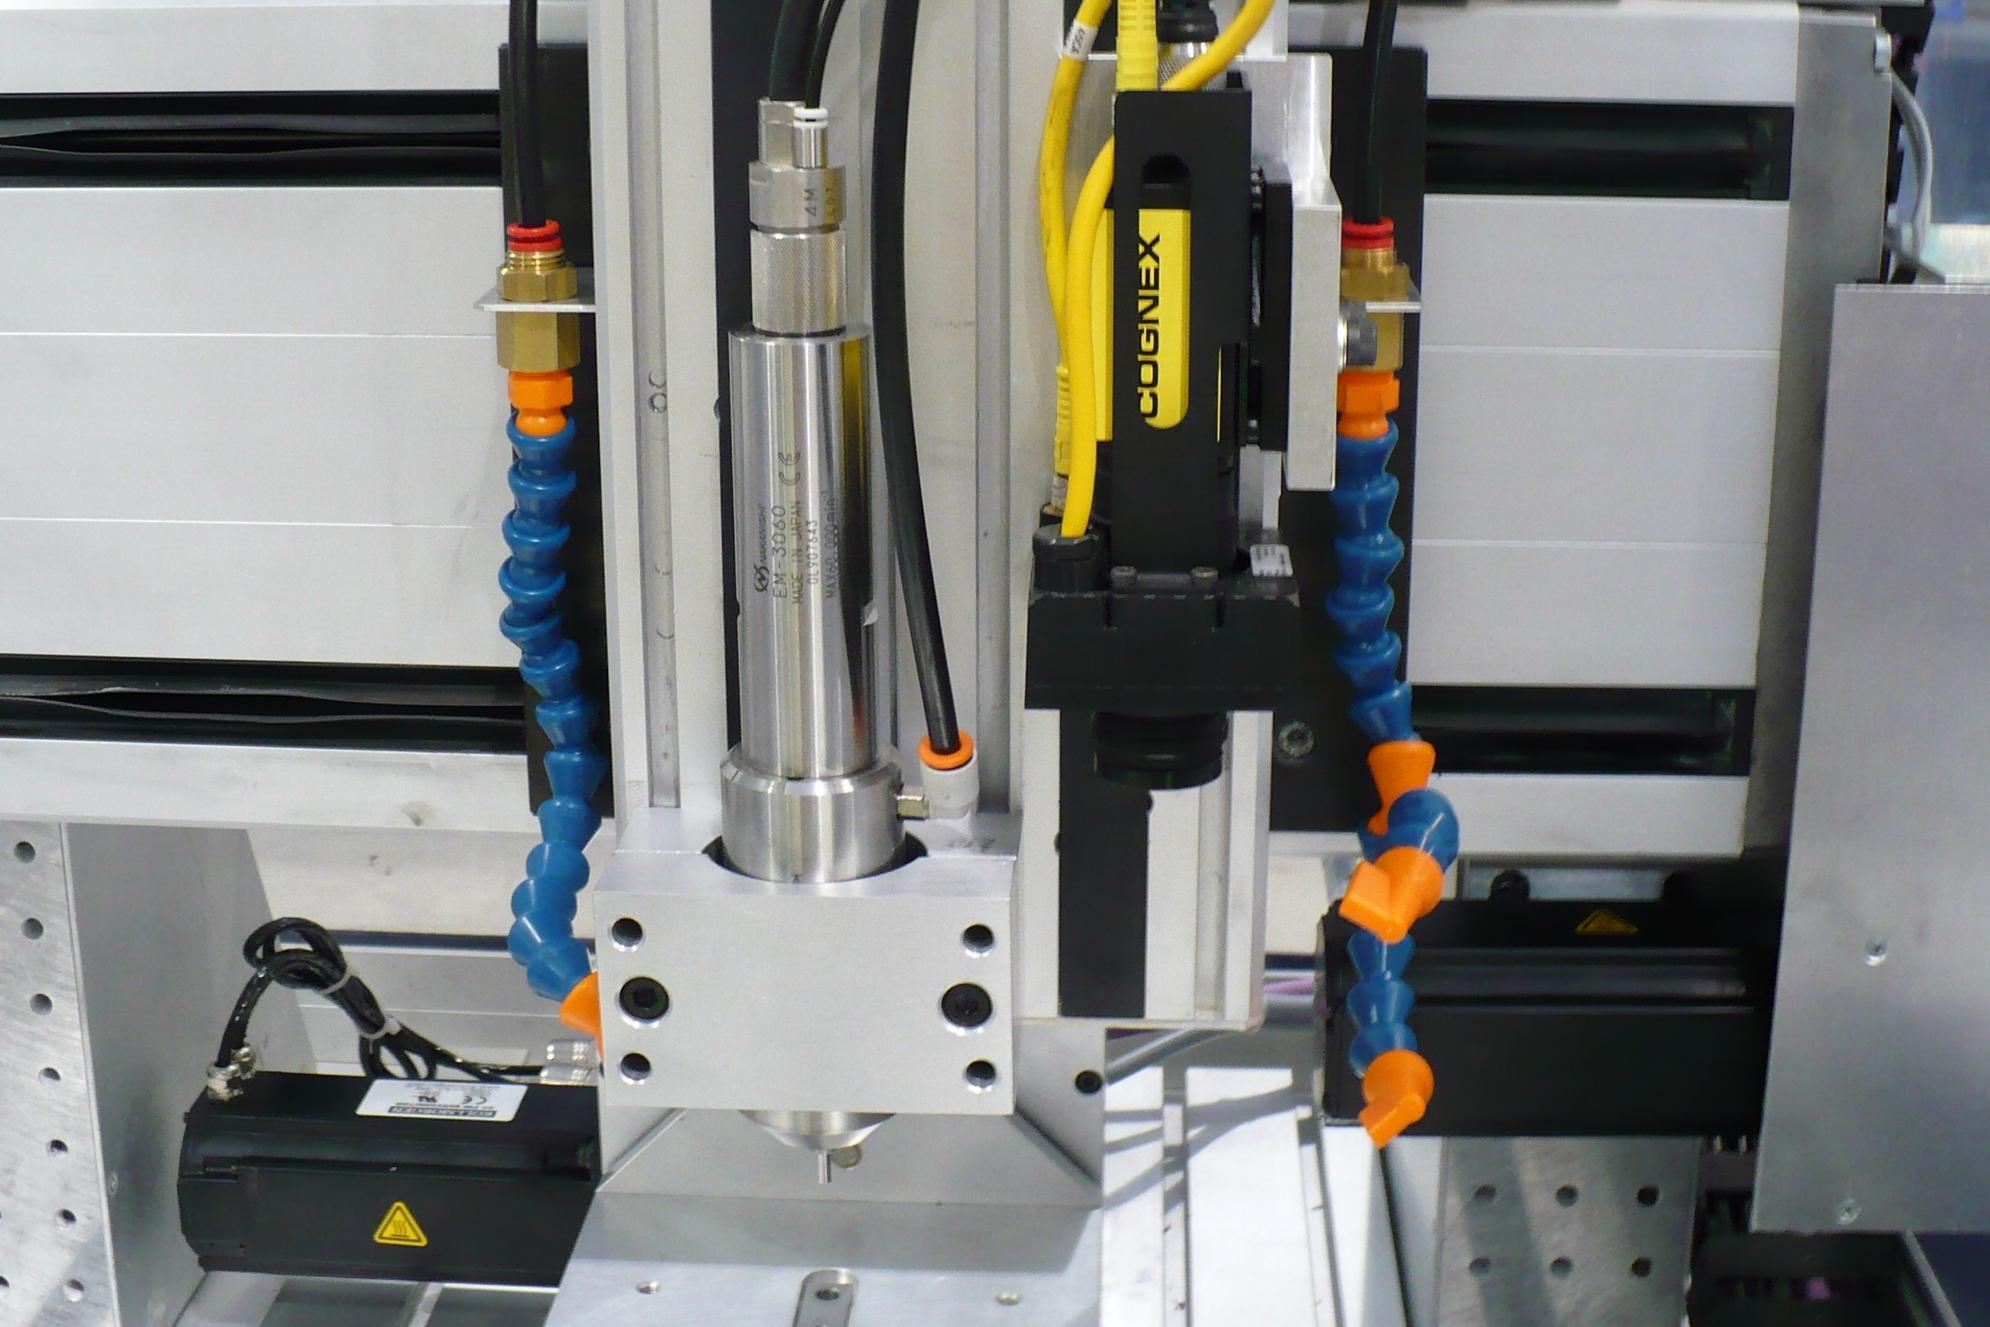 SIEB & MEYER CNC 9 CONTROL TURBINE ROUTER